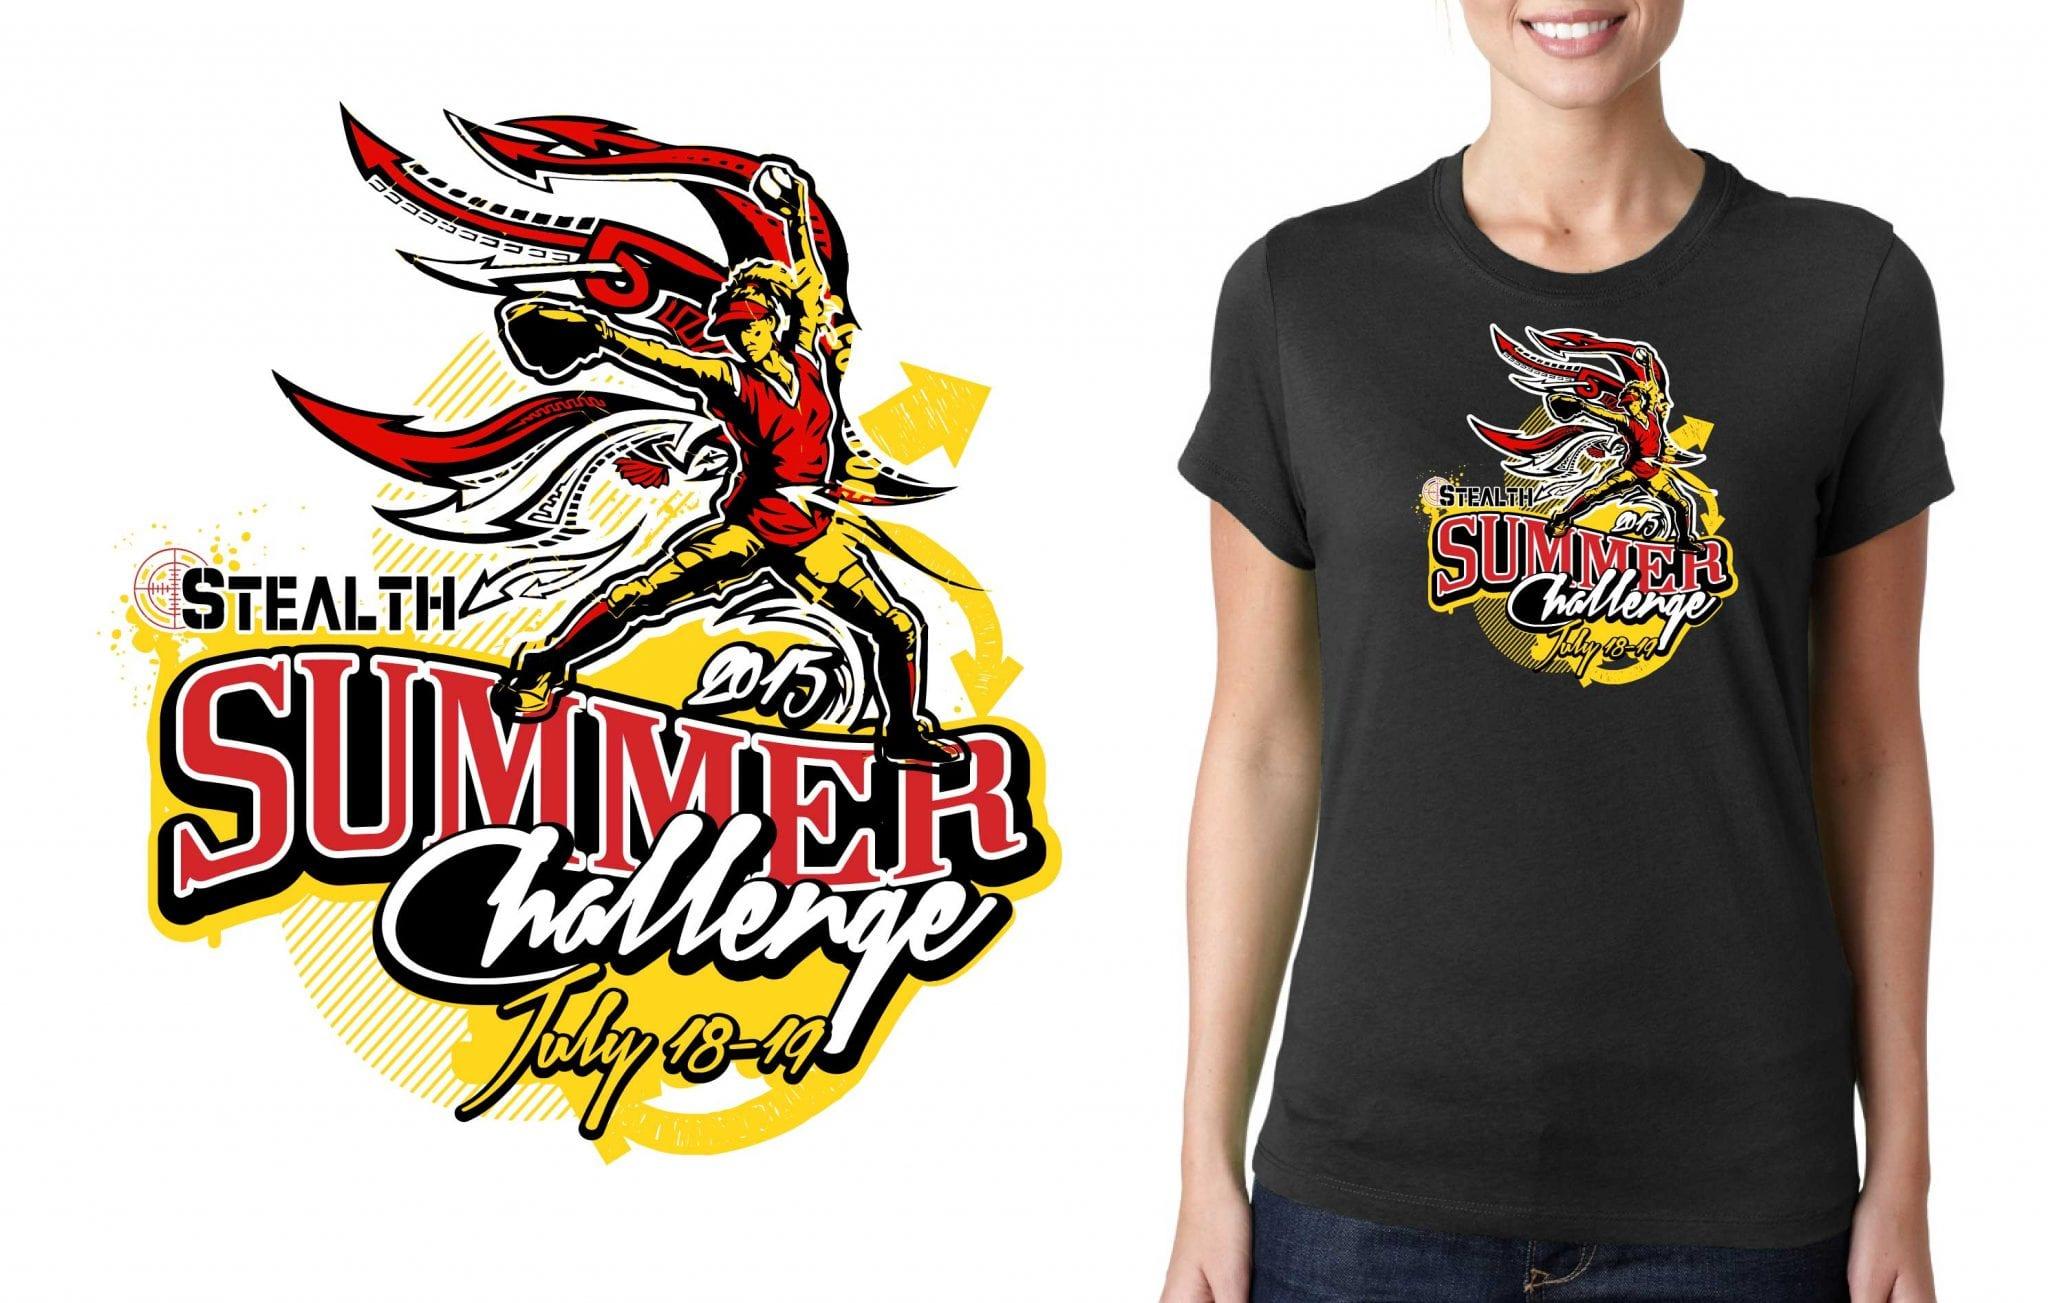 2015 Stealth Summer Challenge PRINT READY